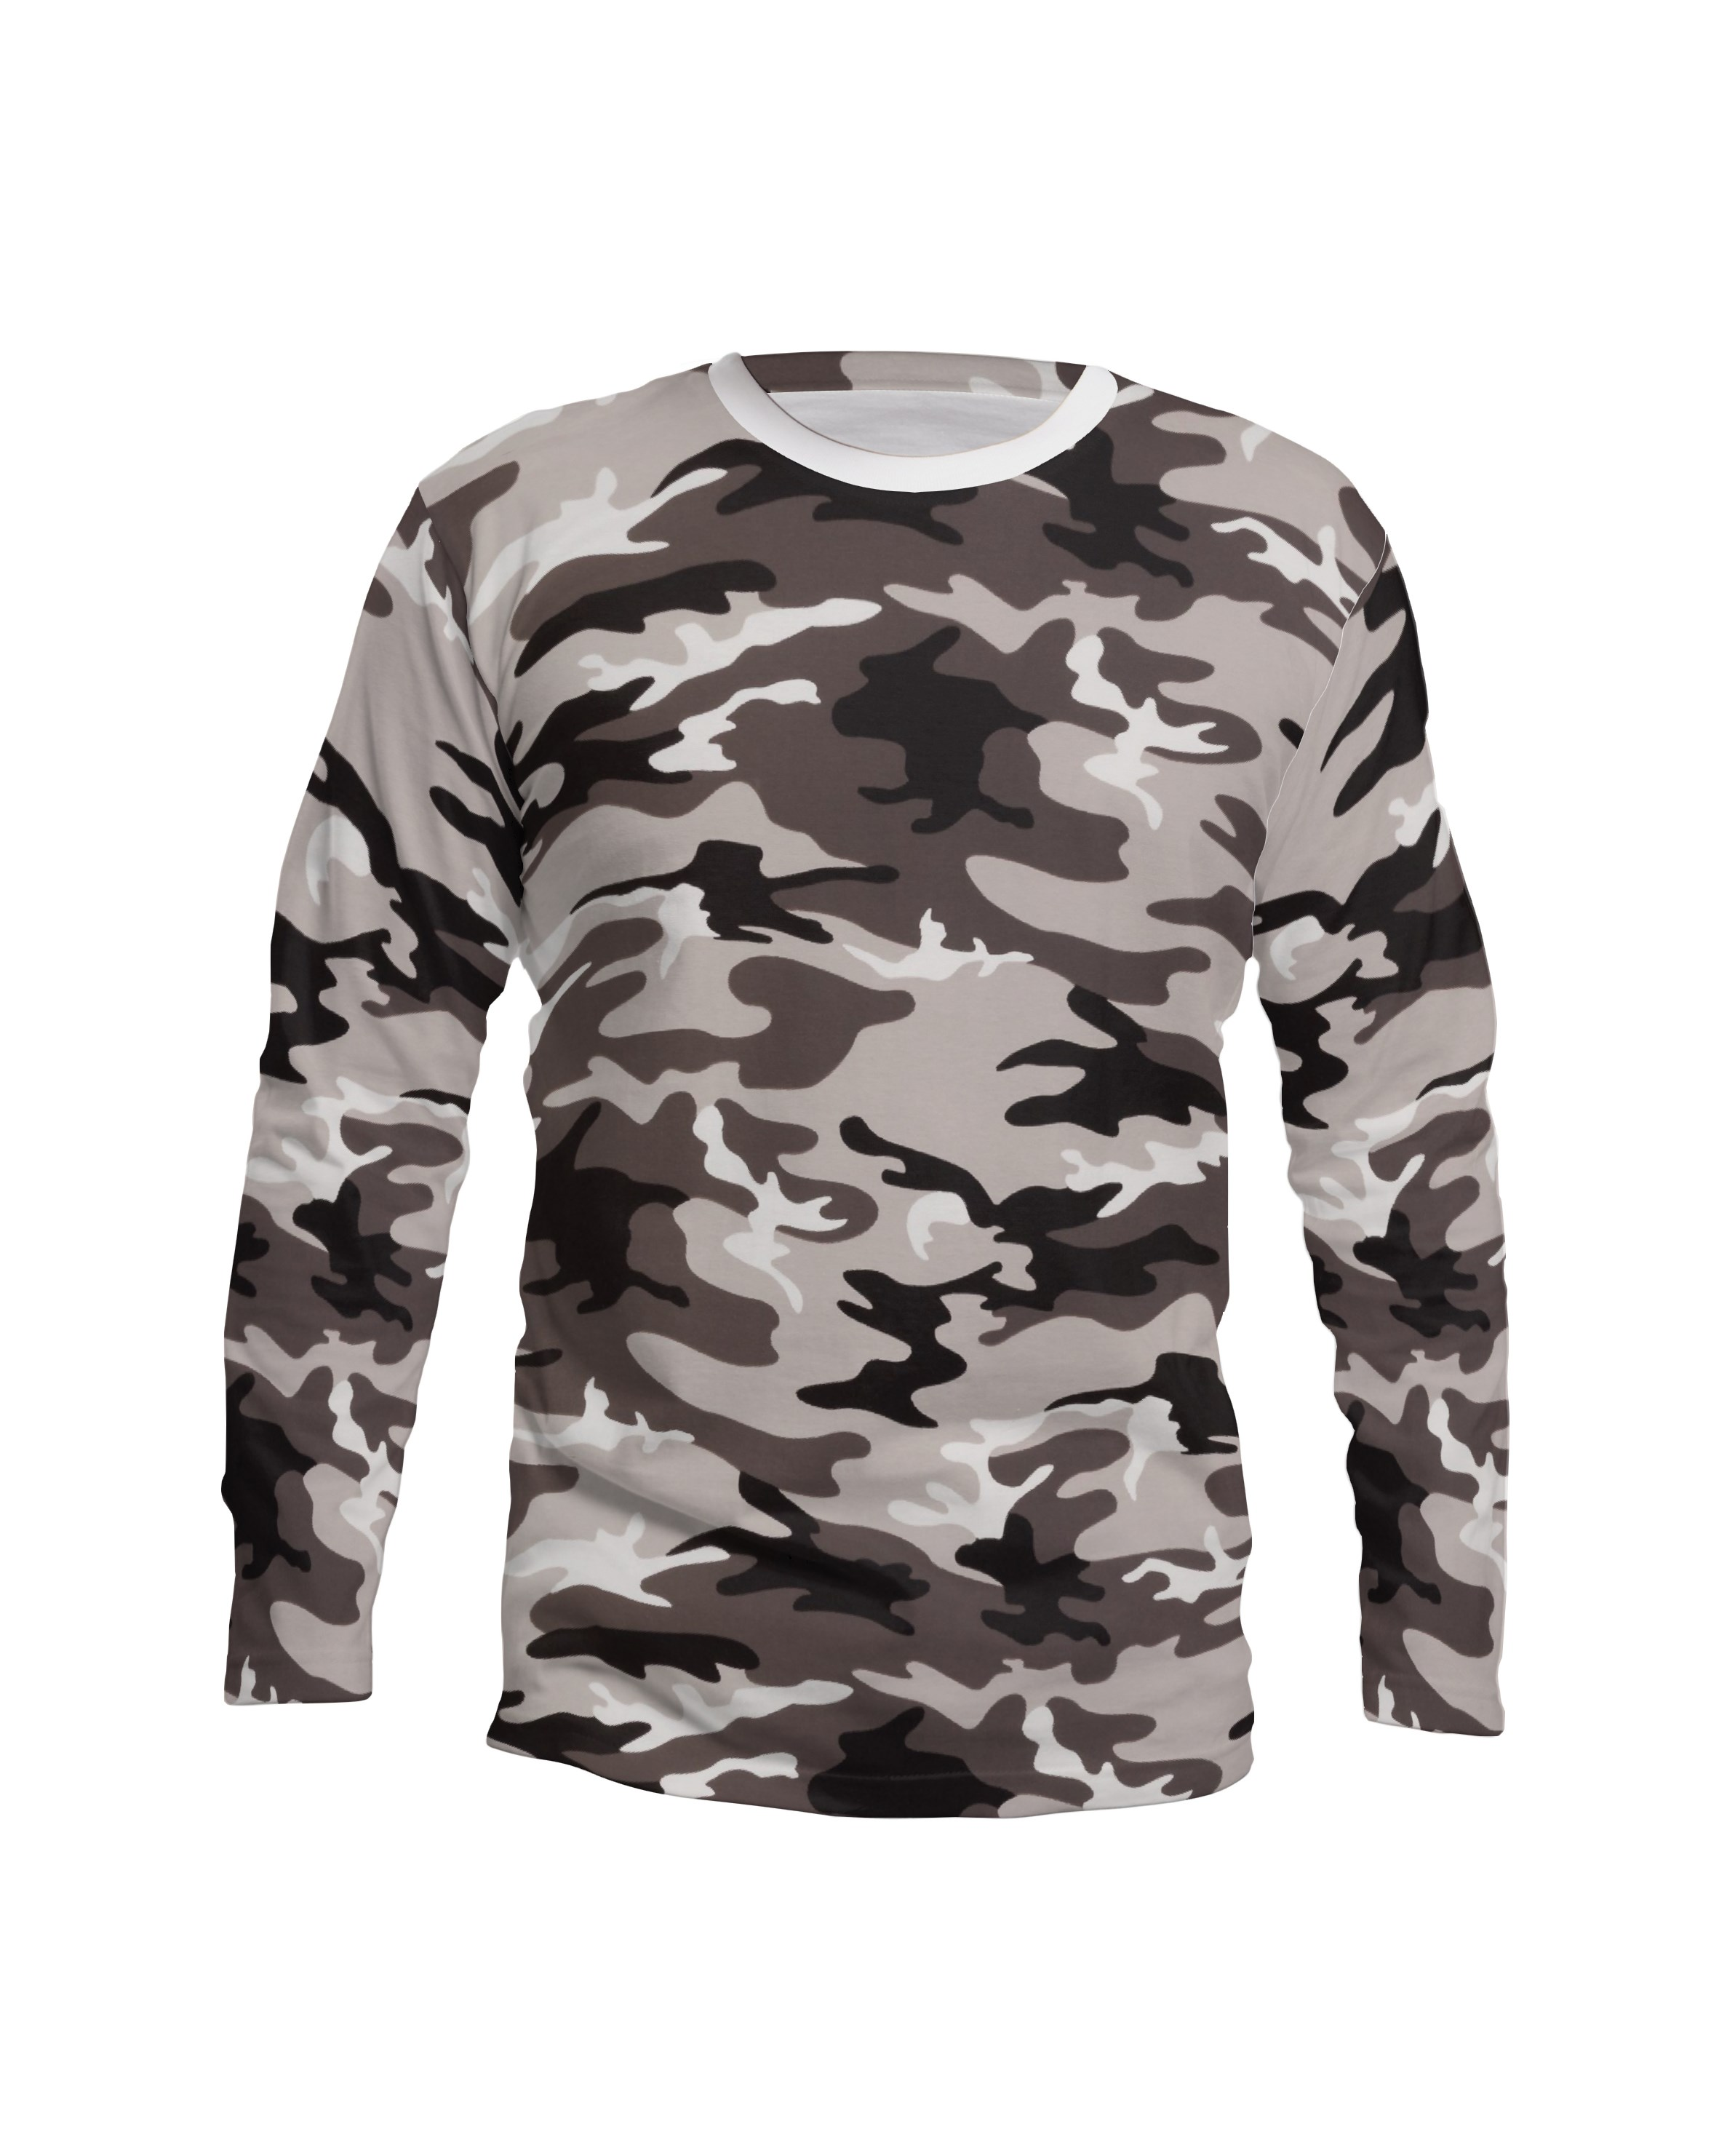 jersey stoff camouflage jersey grau stoffe online shop. Black Bedroom Furniture Sets. Home Design Ideas